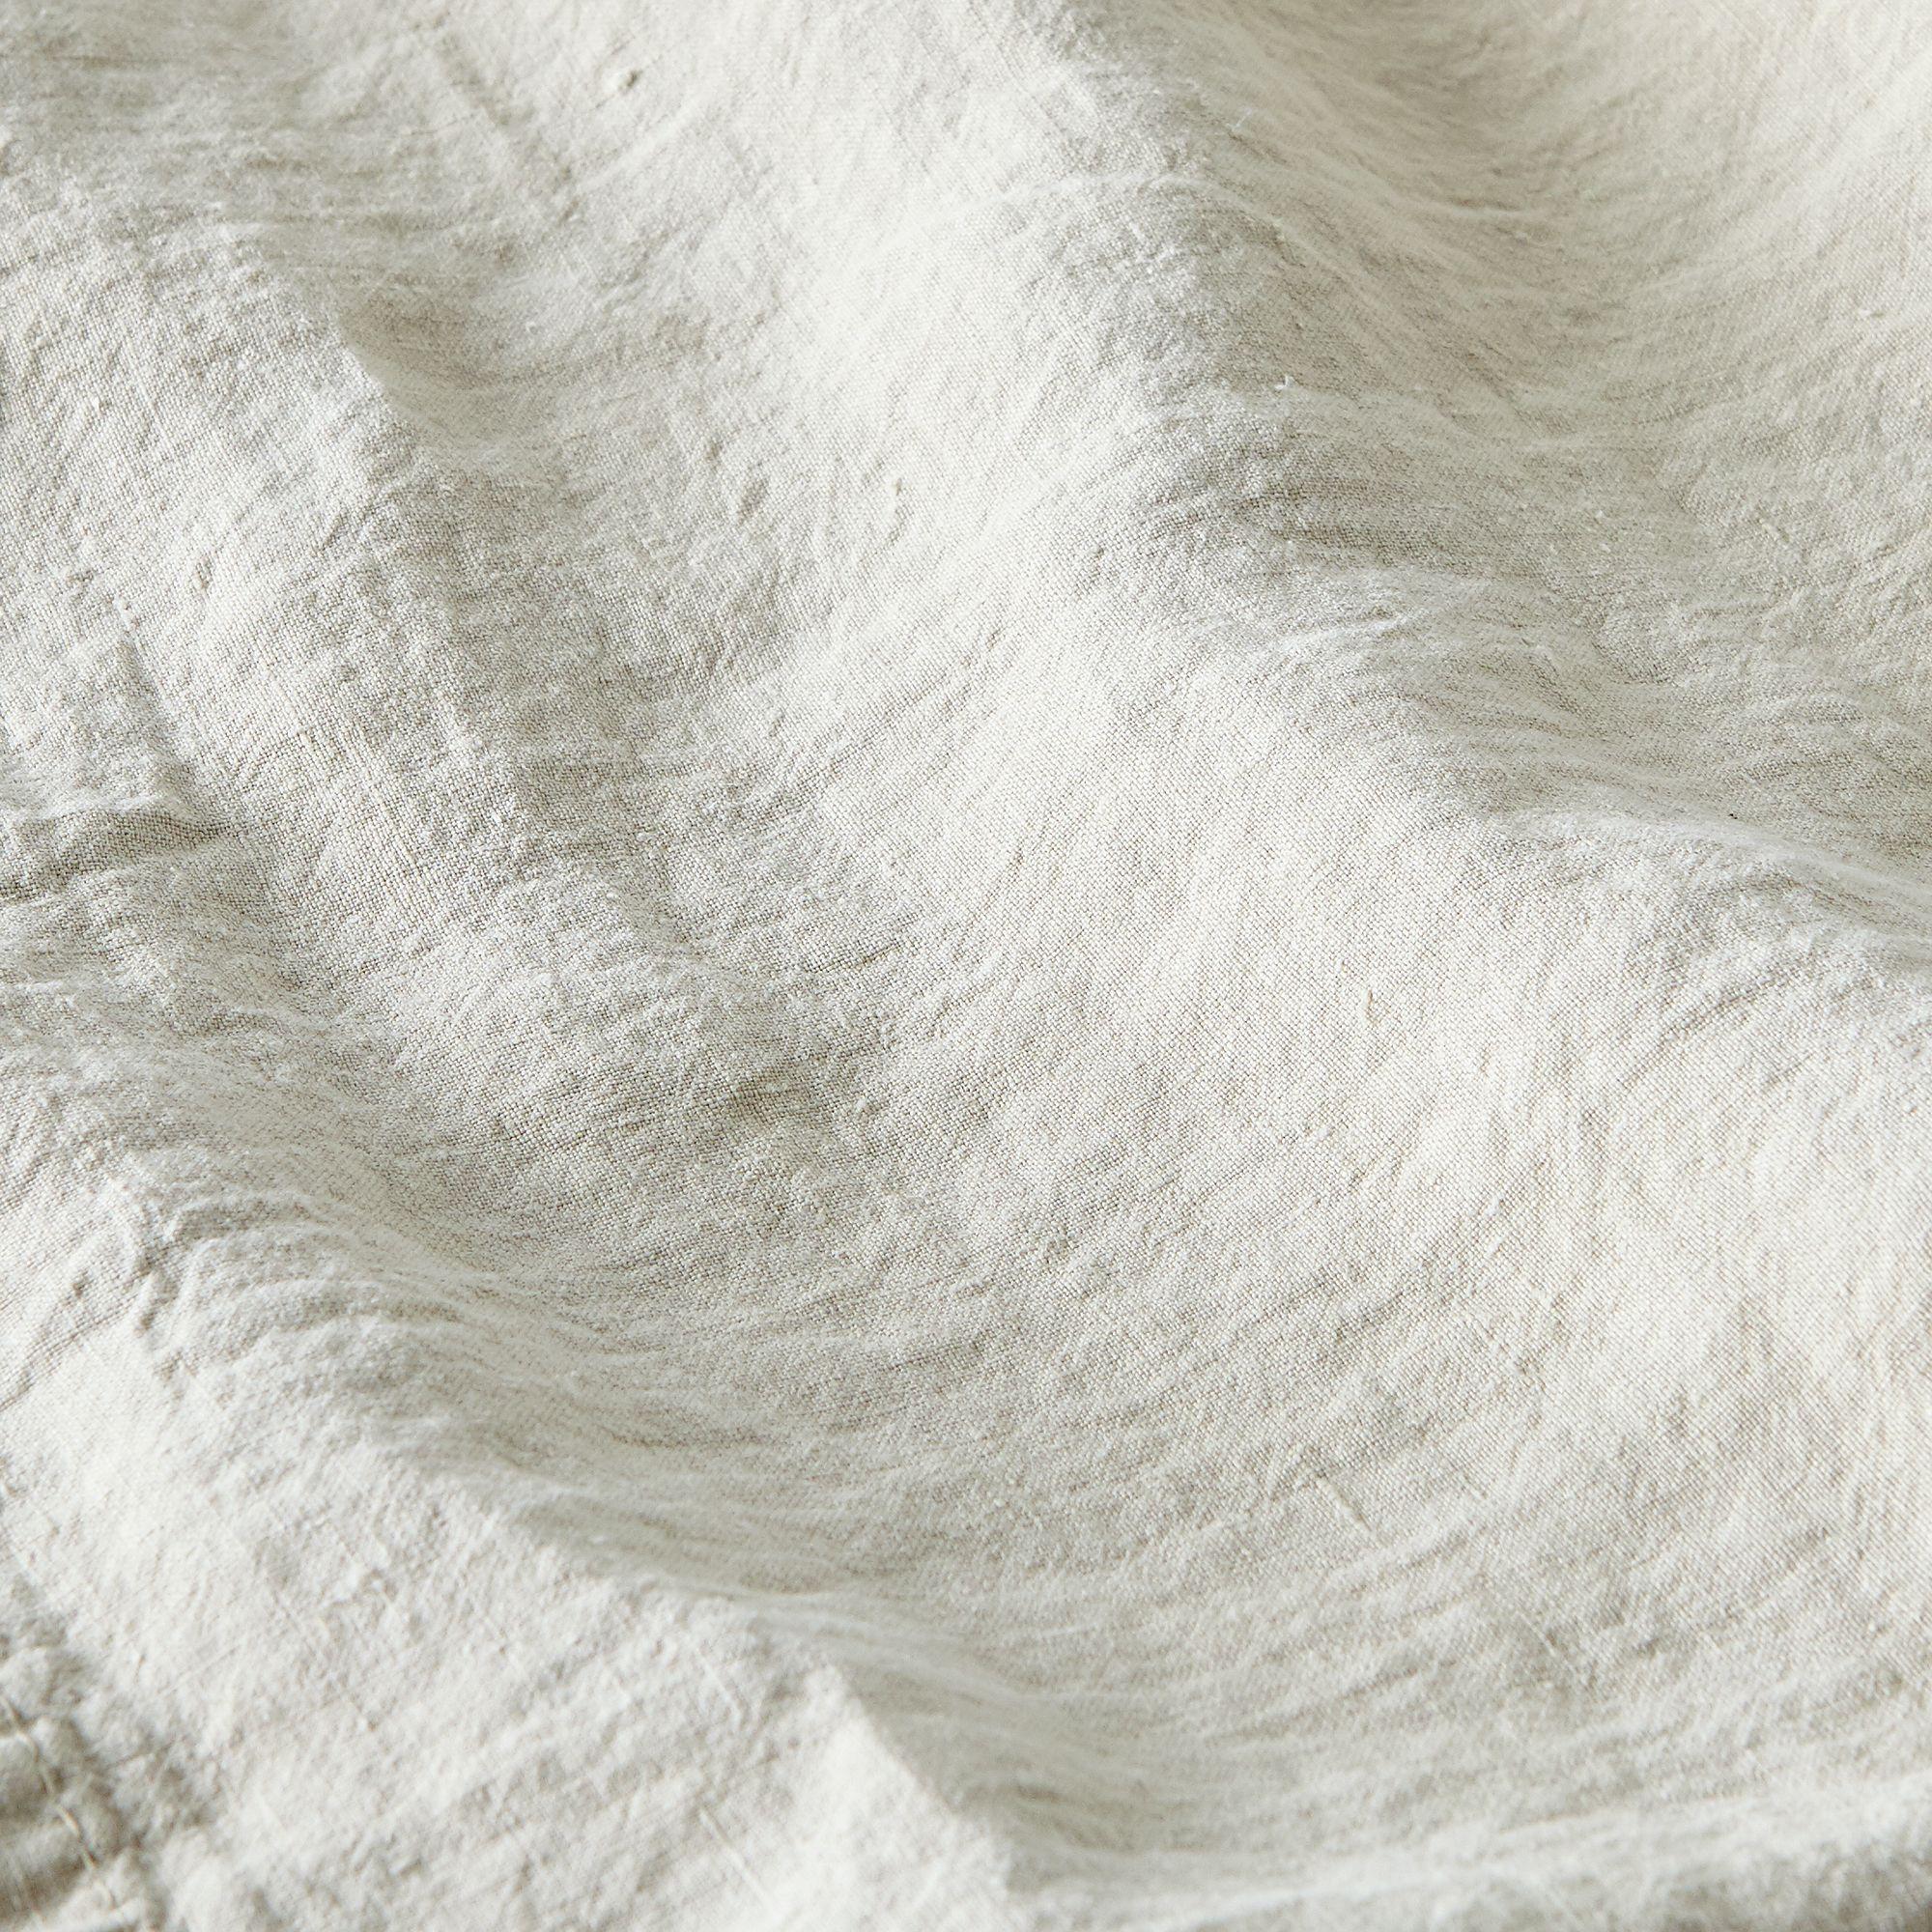 0c31166c a0f9 11e5 a190 0ef7535729df  2015 1008 hawkins ny stonewashed linen bedding sheet flax silo rocky luten 004